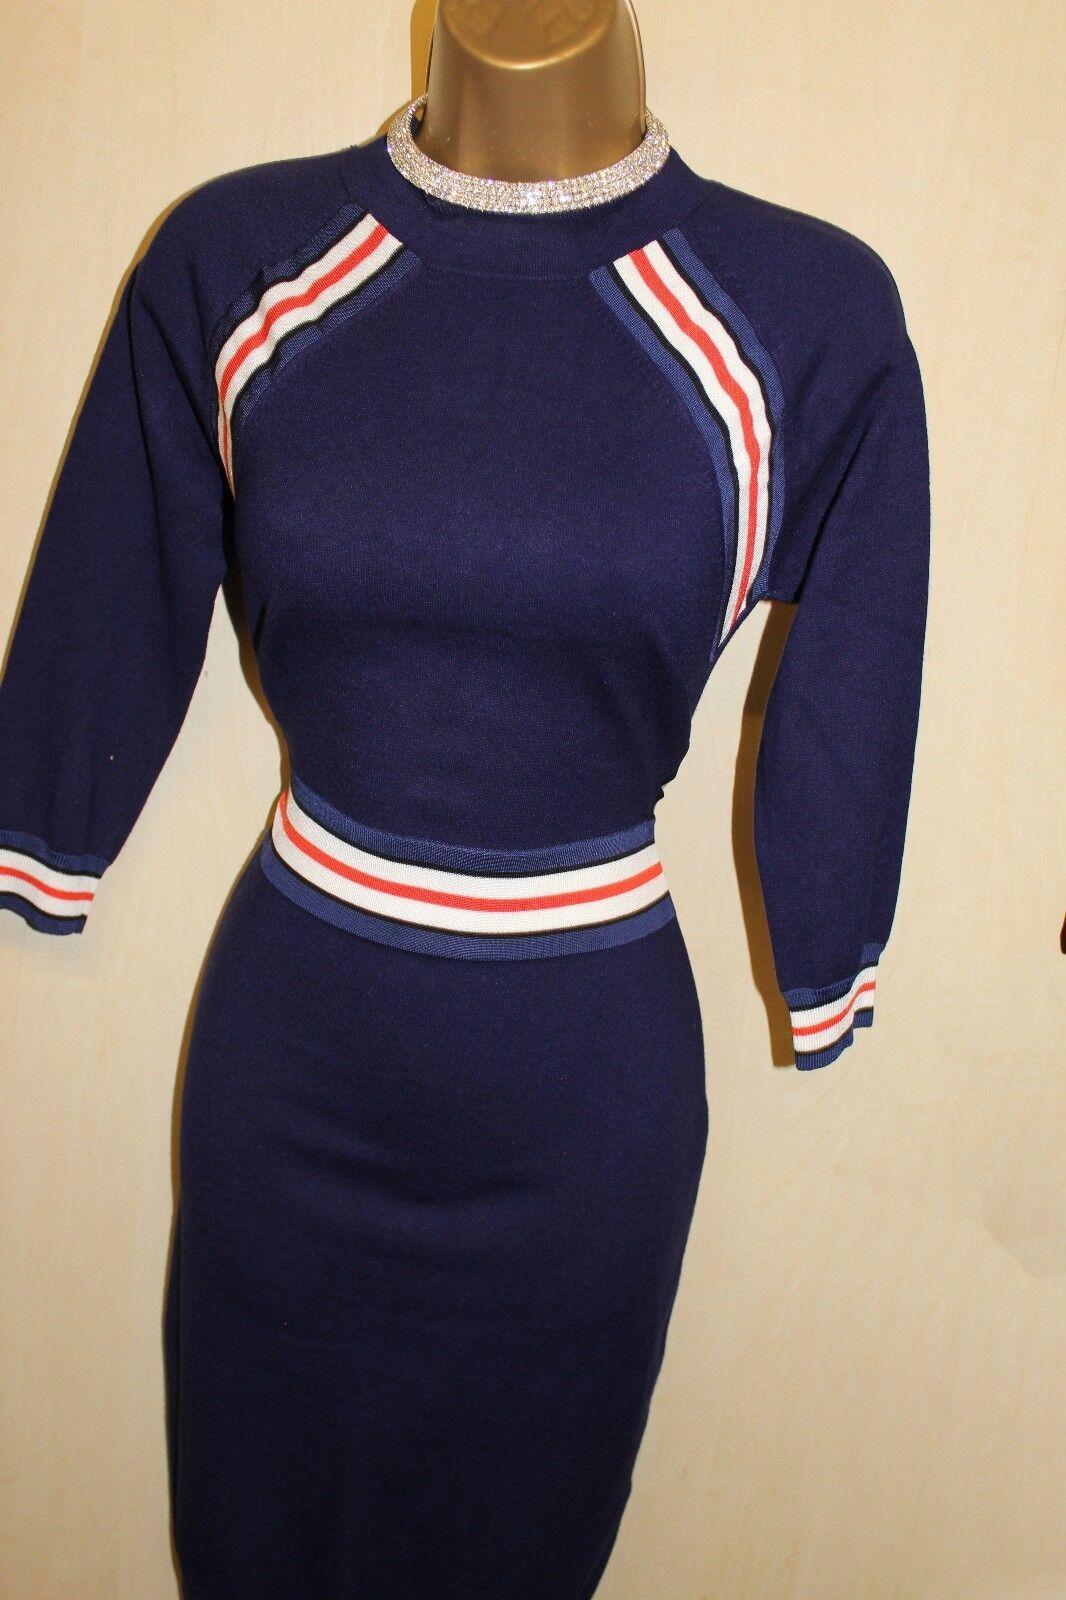 - - - Grande UK KM 14-16 Karen Millen Celebrity Blu Navy a Righe Maglione Abito Bodycon Knit 177587